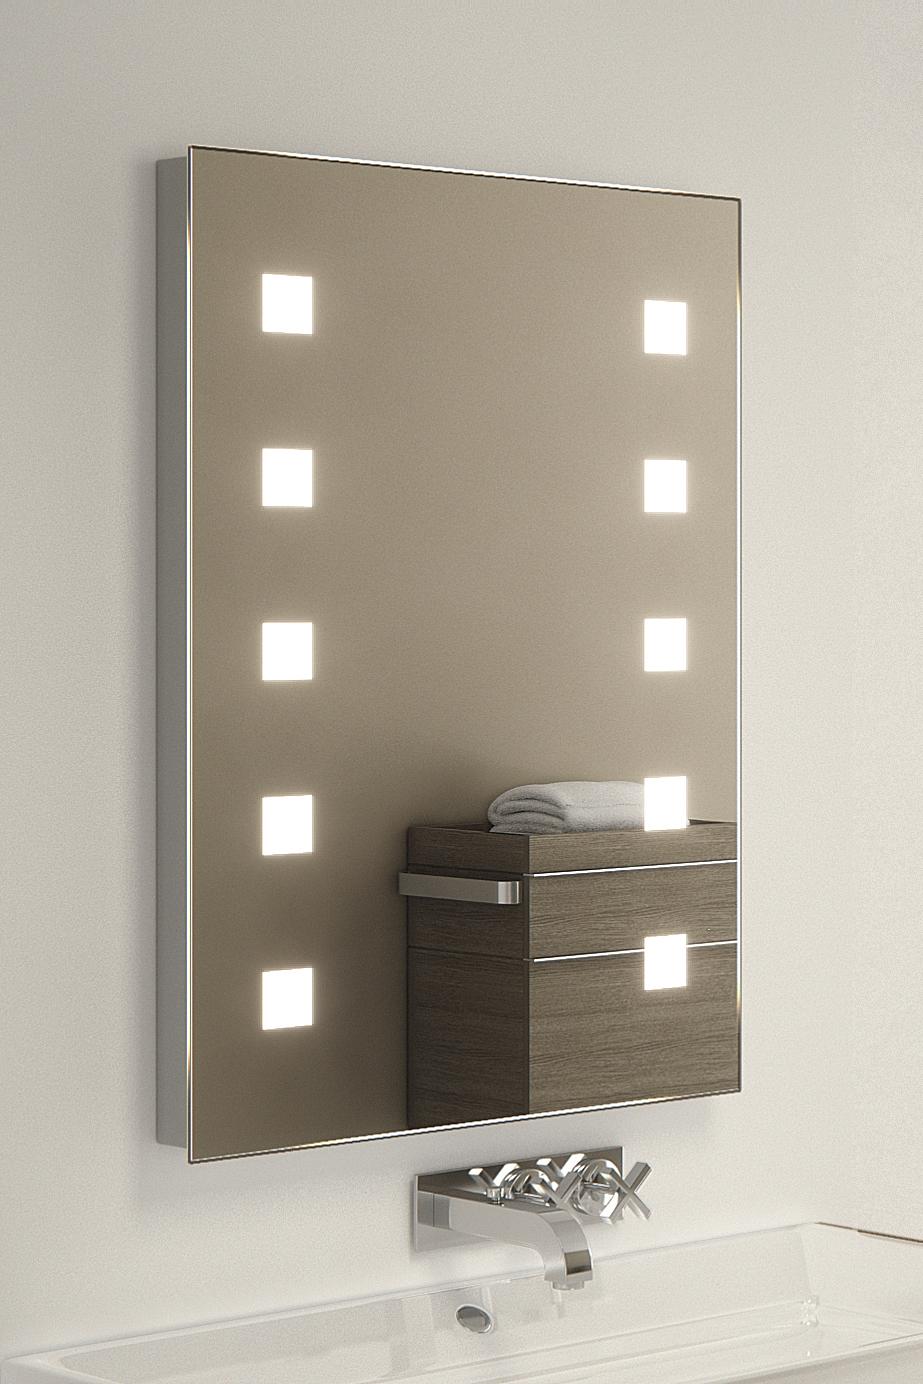 Nanban shaver led bathroom illuminated mirror with demister pad sensor k209i ebay for Illuminated mirrors for bathrooms